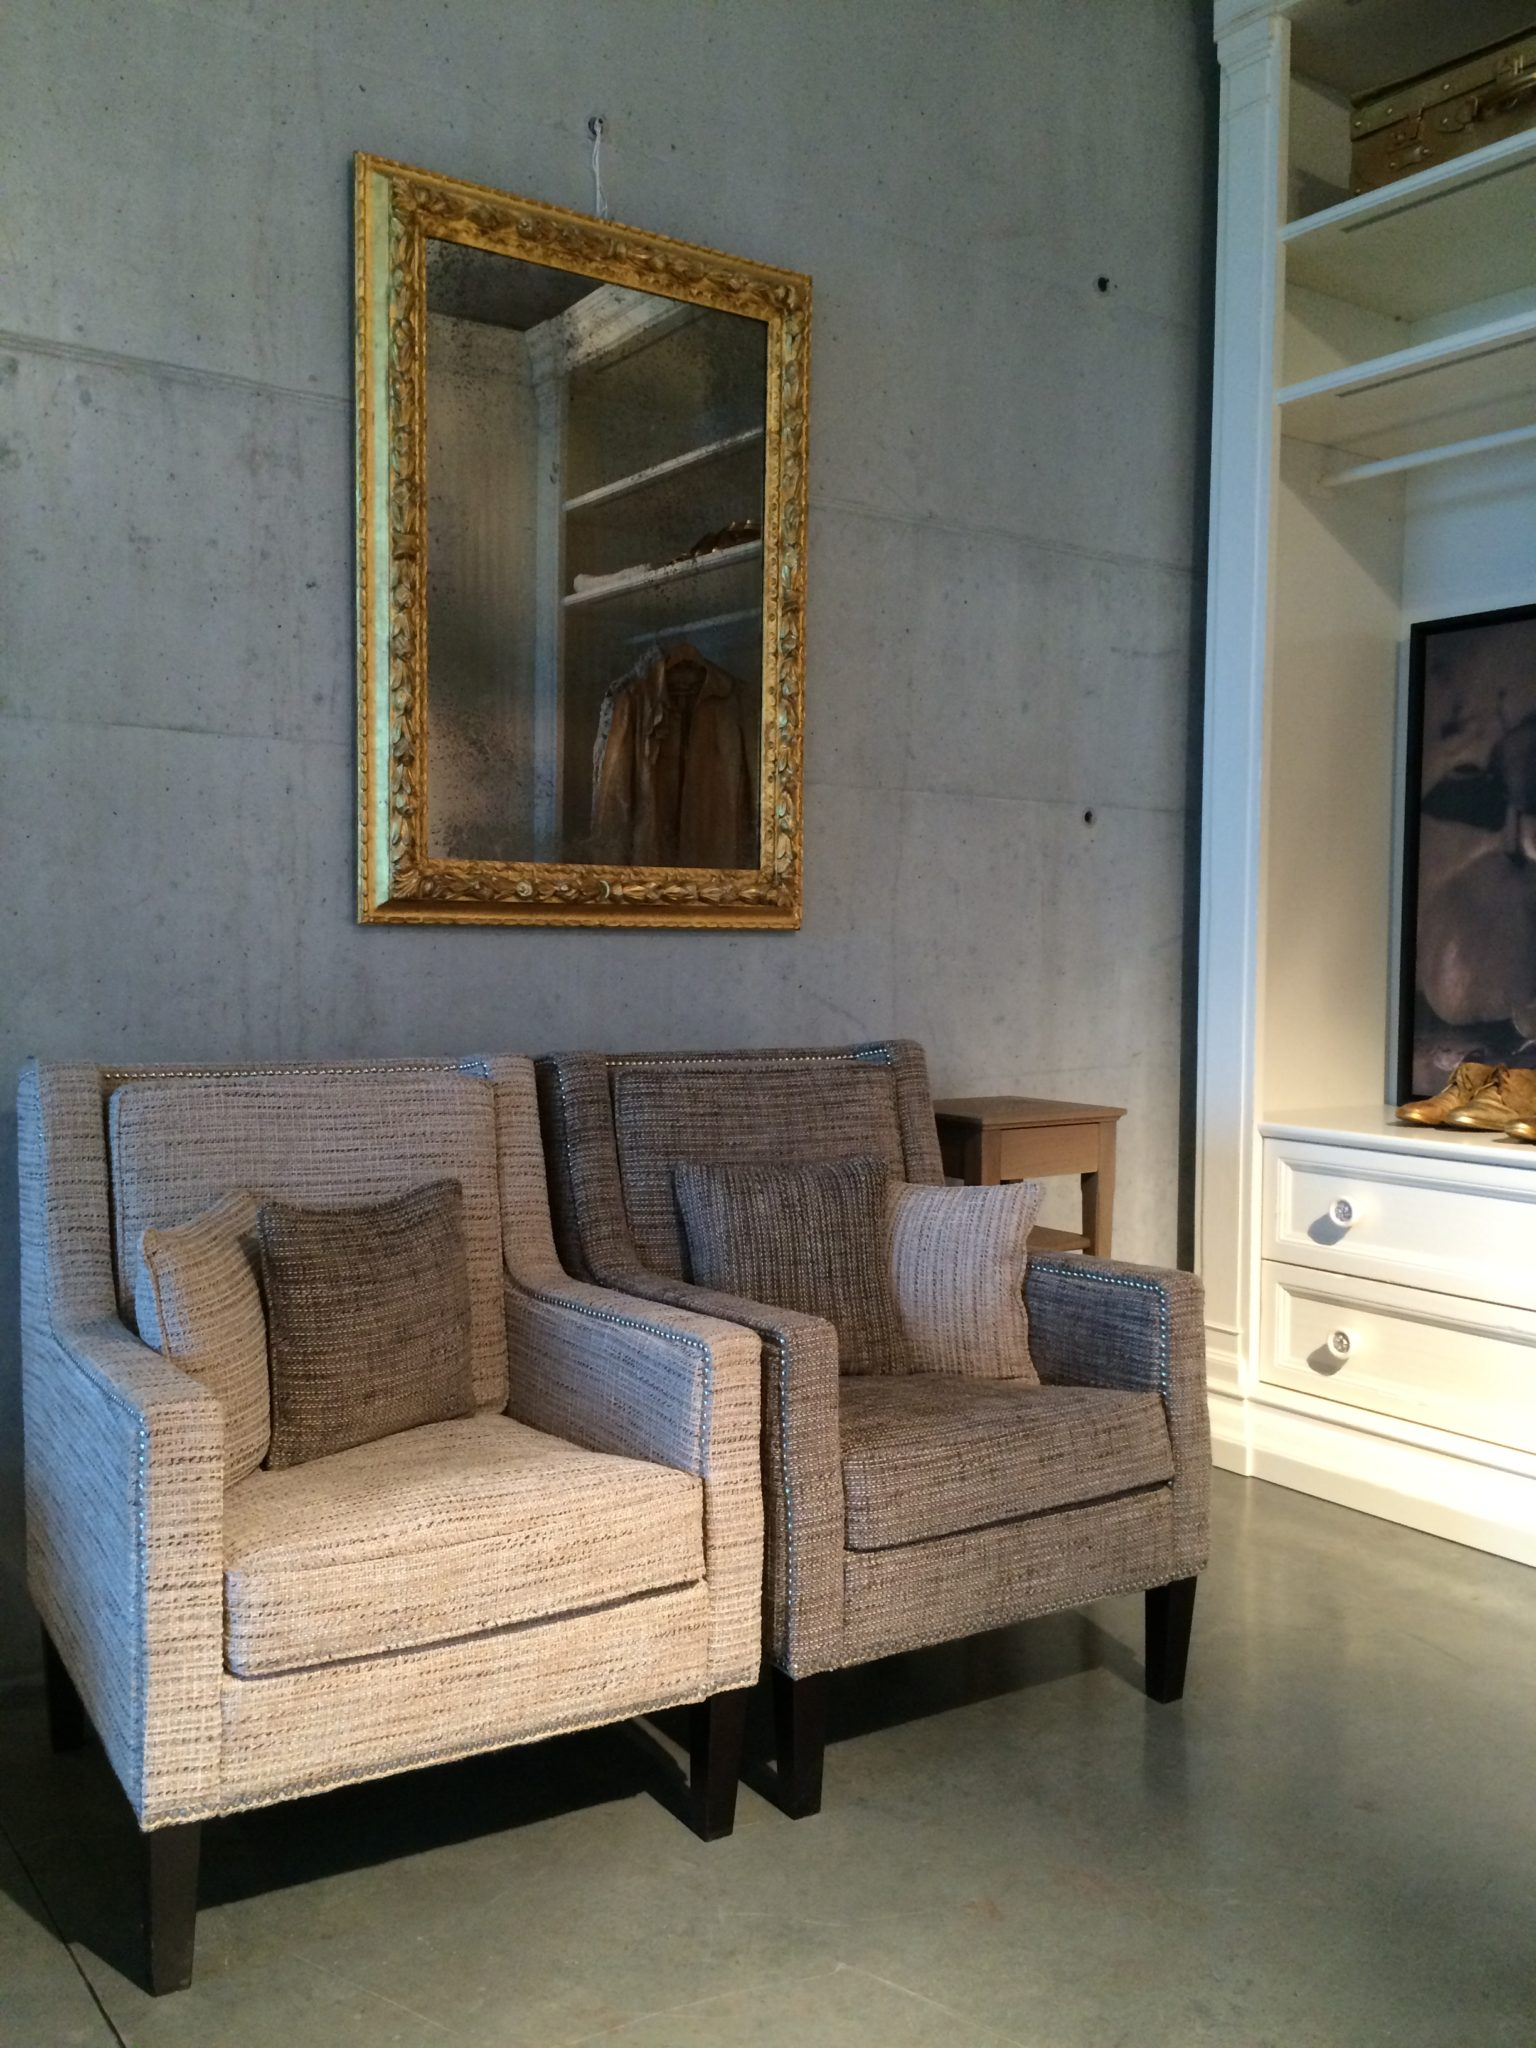 27 how_to_choose_a_perfect_sofa_home_ideas_interior_design_italian_furniture_jak_wybrac_najlepsza_kanape_urzadzanie_mieszkania_meble_wloskie_marchettin_maison_italia_forelements_blog